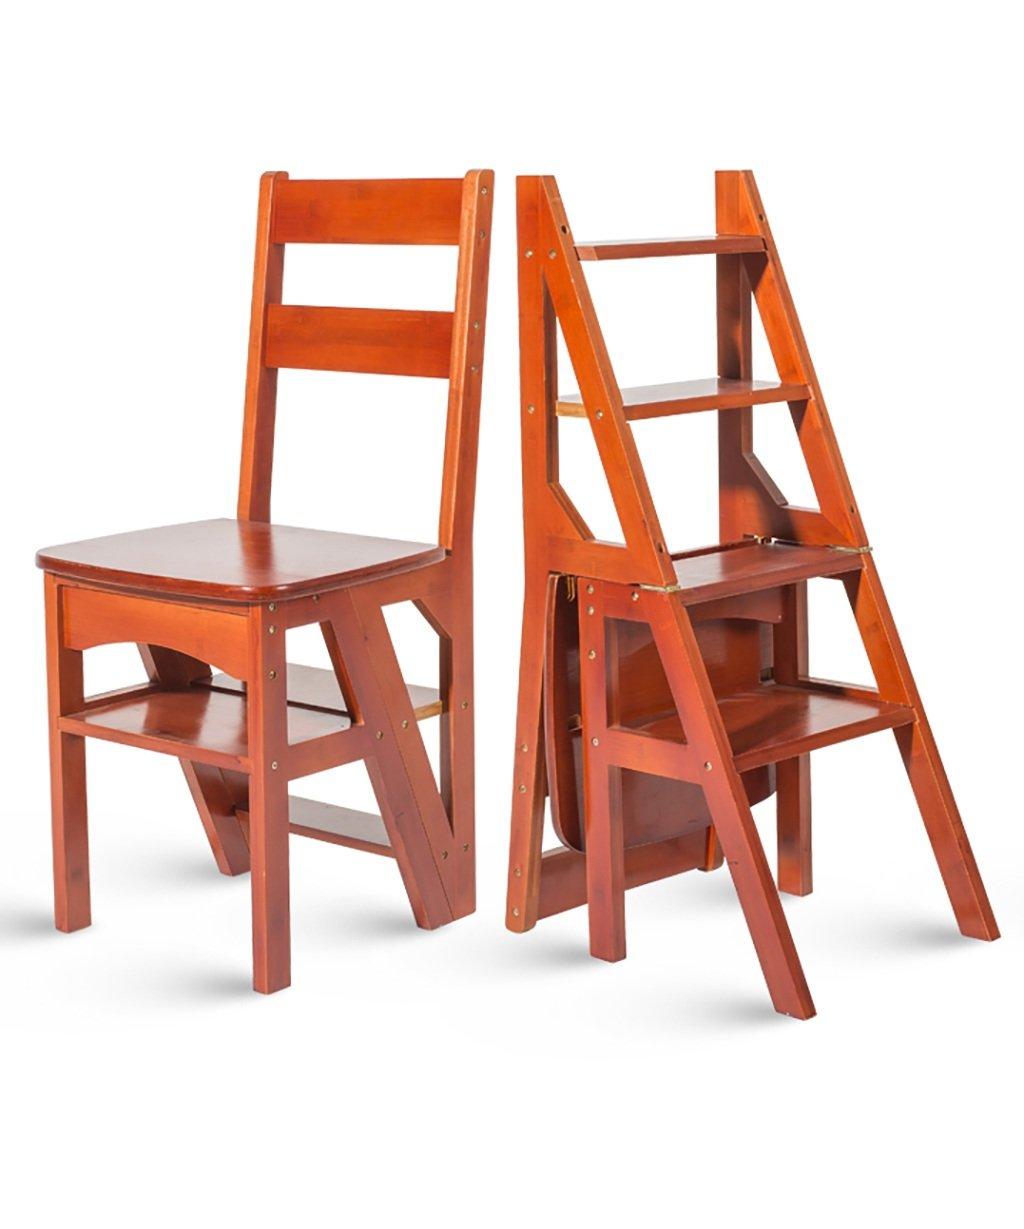 ZEMIN ダイニングチェア椅子の木の木製折り畳み 木製折りたたみ式背もたれ椅子4段階段階段多機能、4色使用可能、40 * 39 * 89CM ( 色 : ブラウン ぶらうん ) B078WP7B9C ブラウン ぶらうん ブラウン ぶらうん